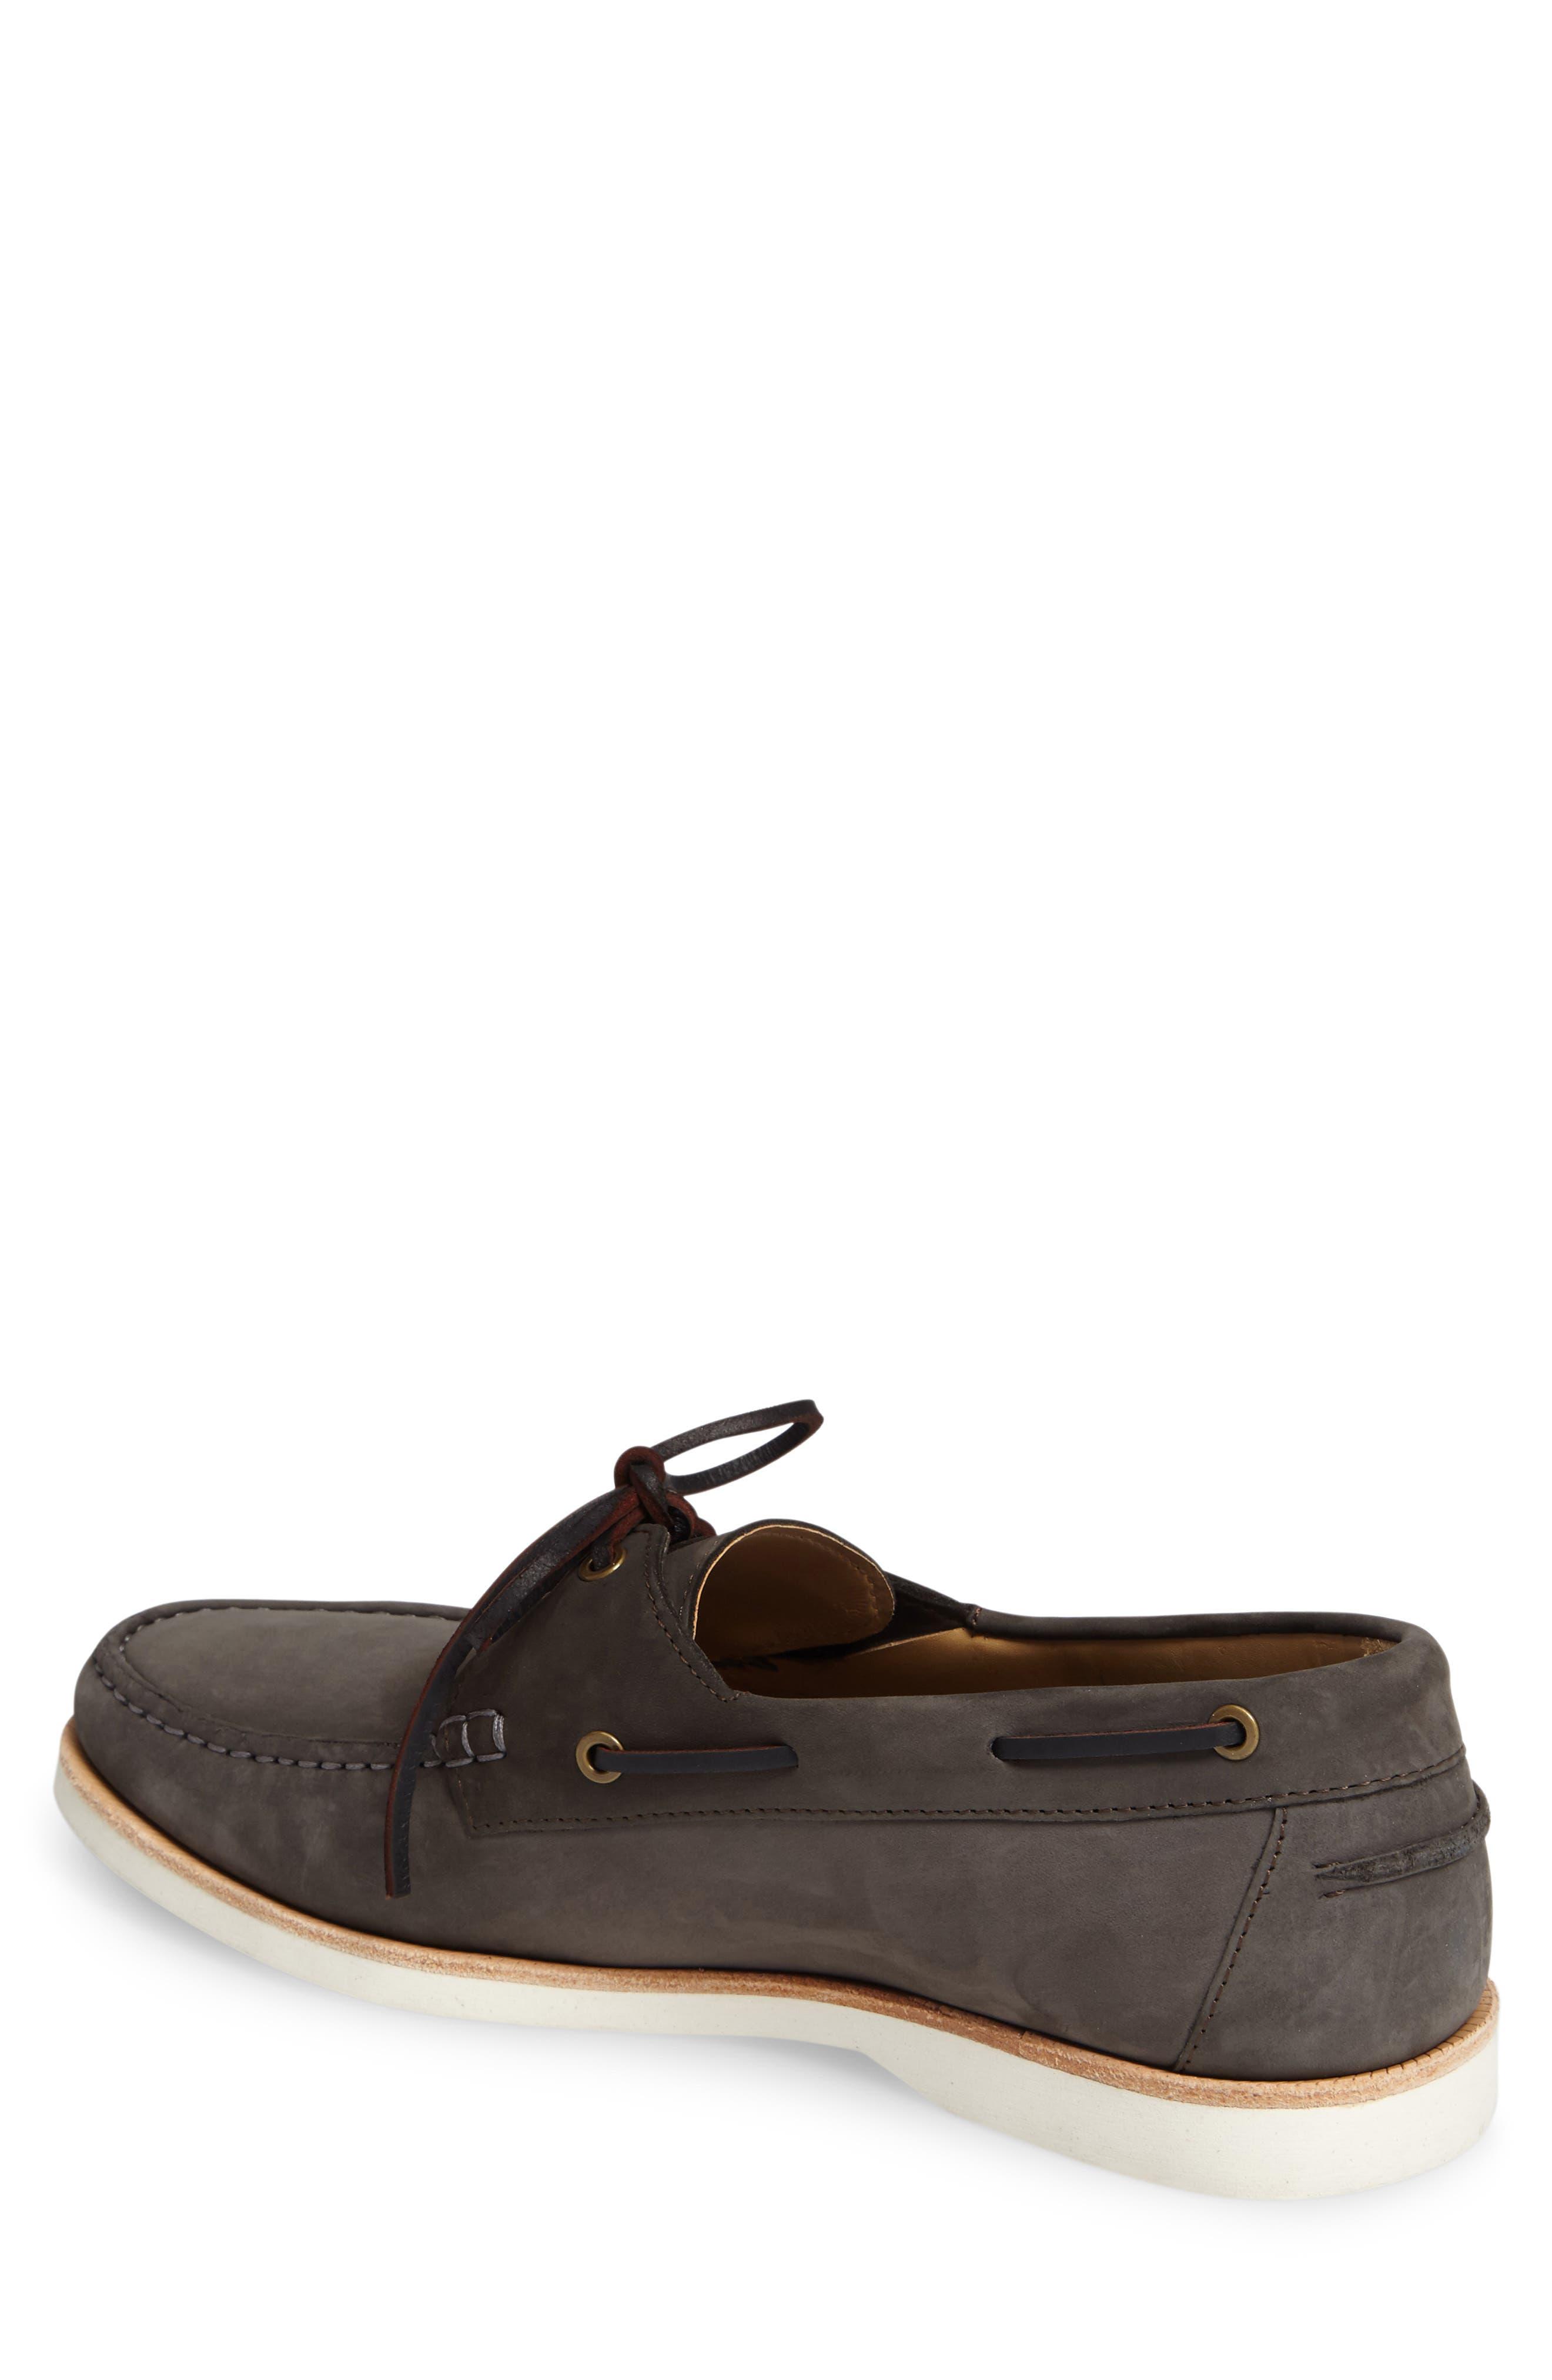 Cooper Boat Shoe,                             Alternate thumbnail 2, color,                             SLATE NUBUCK LEATHER